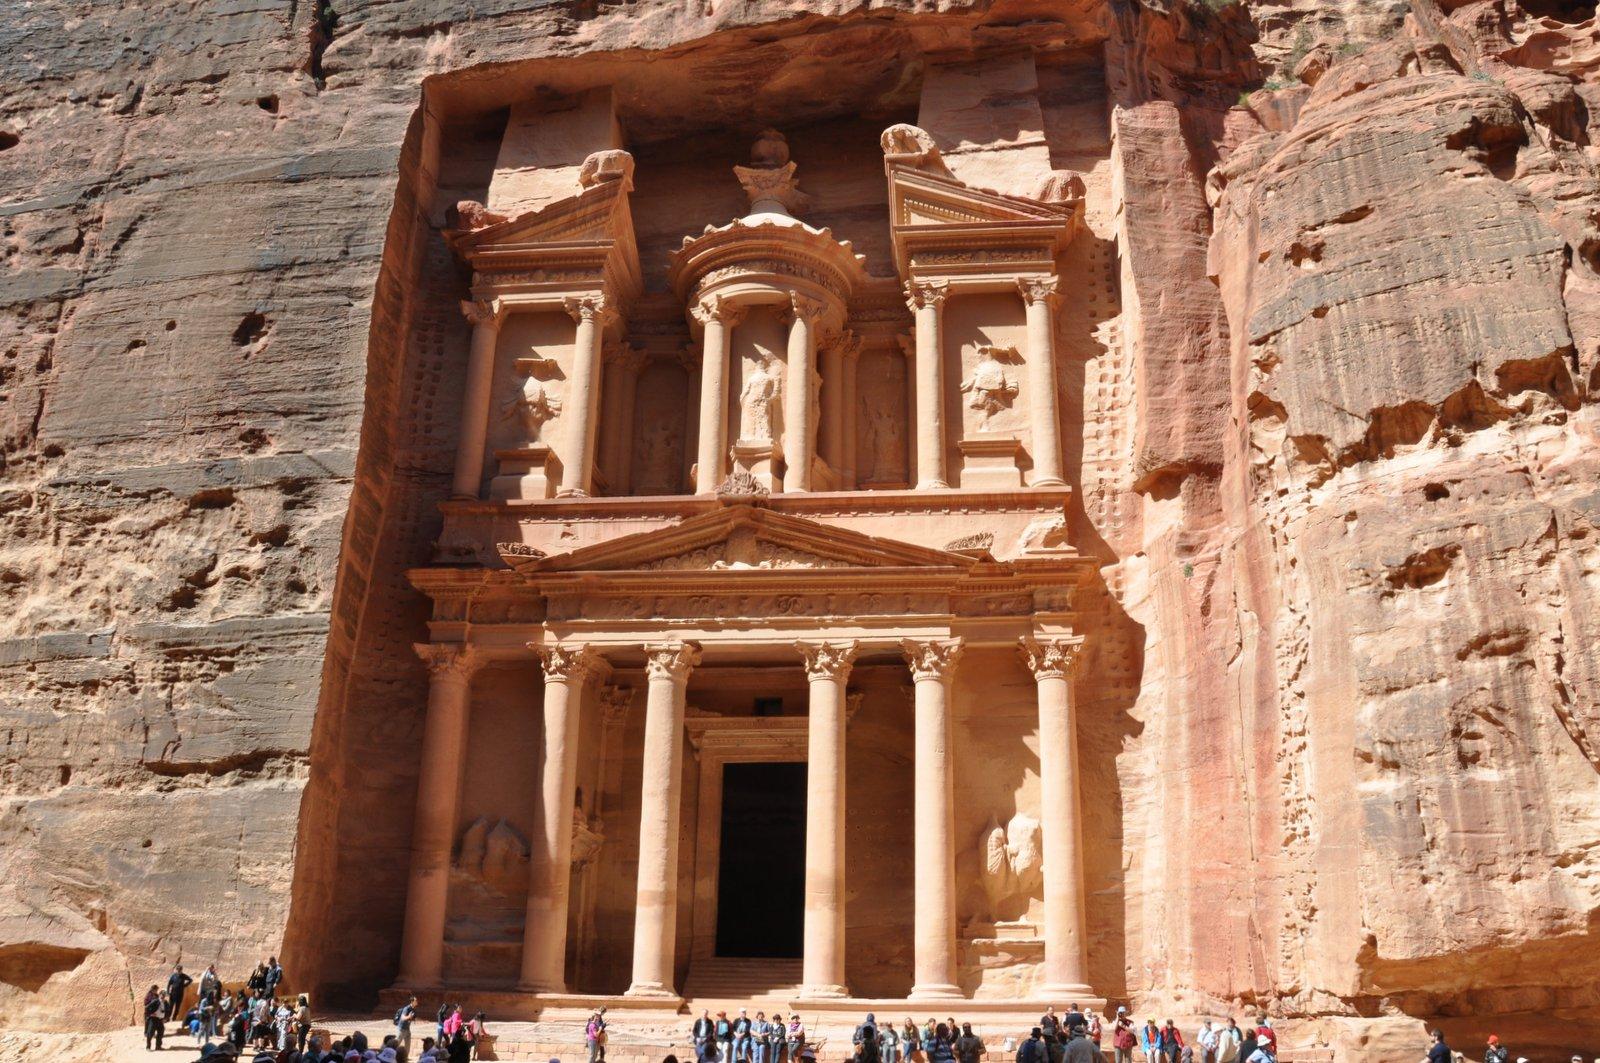 Le Trésor de Petra, Al-Khazneh, une des sept merveilles du monde